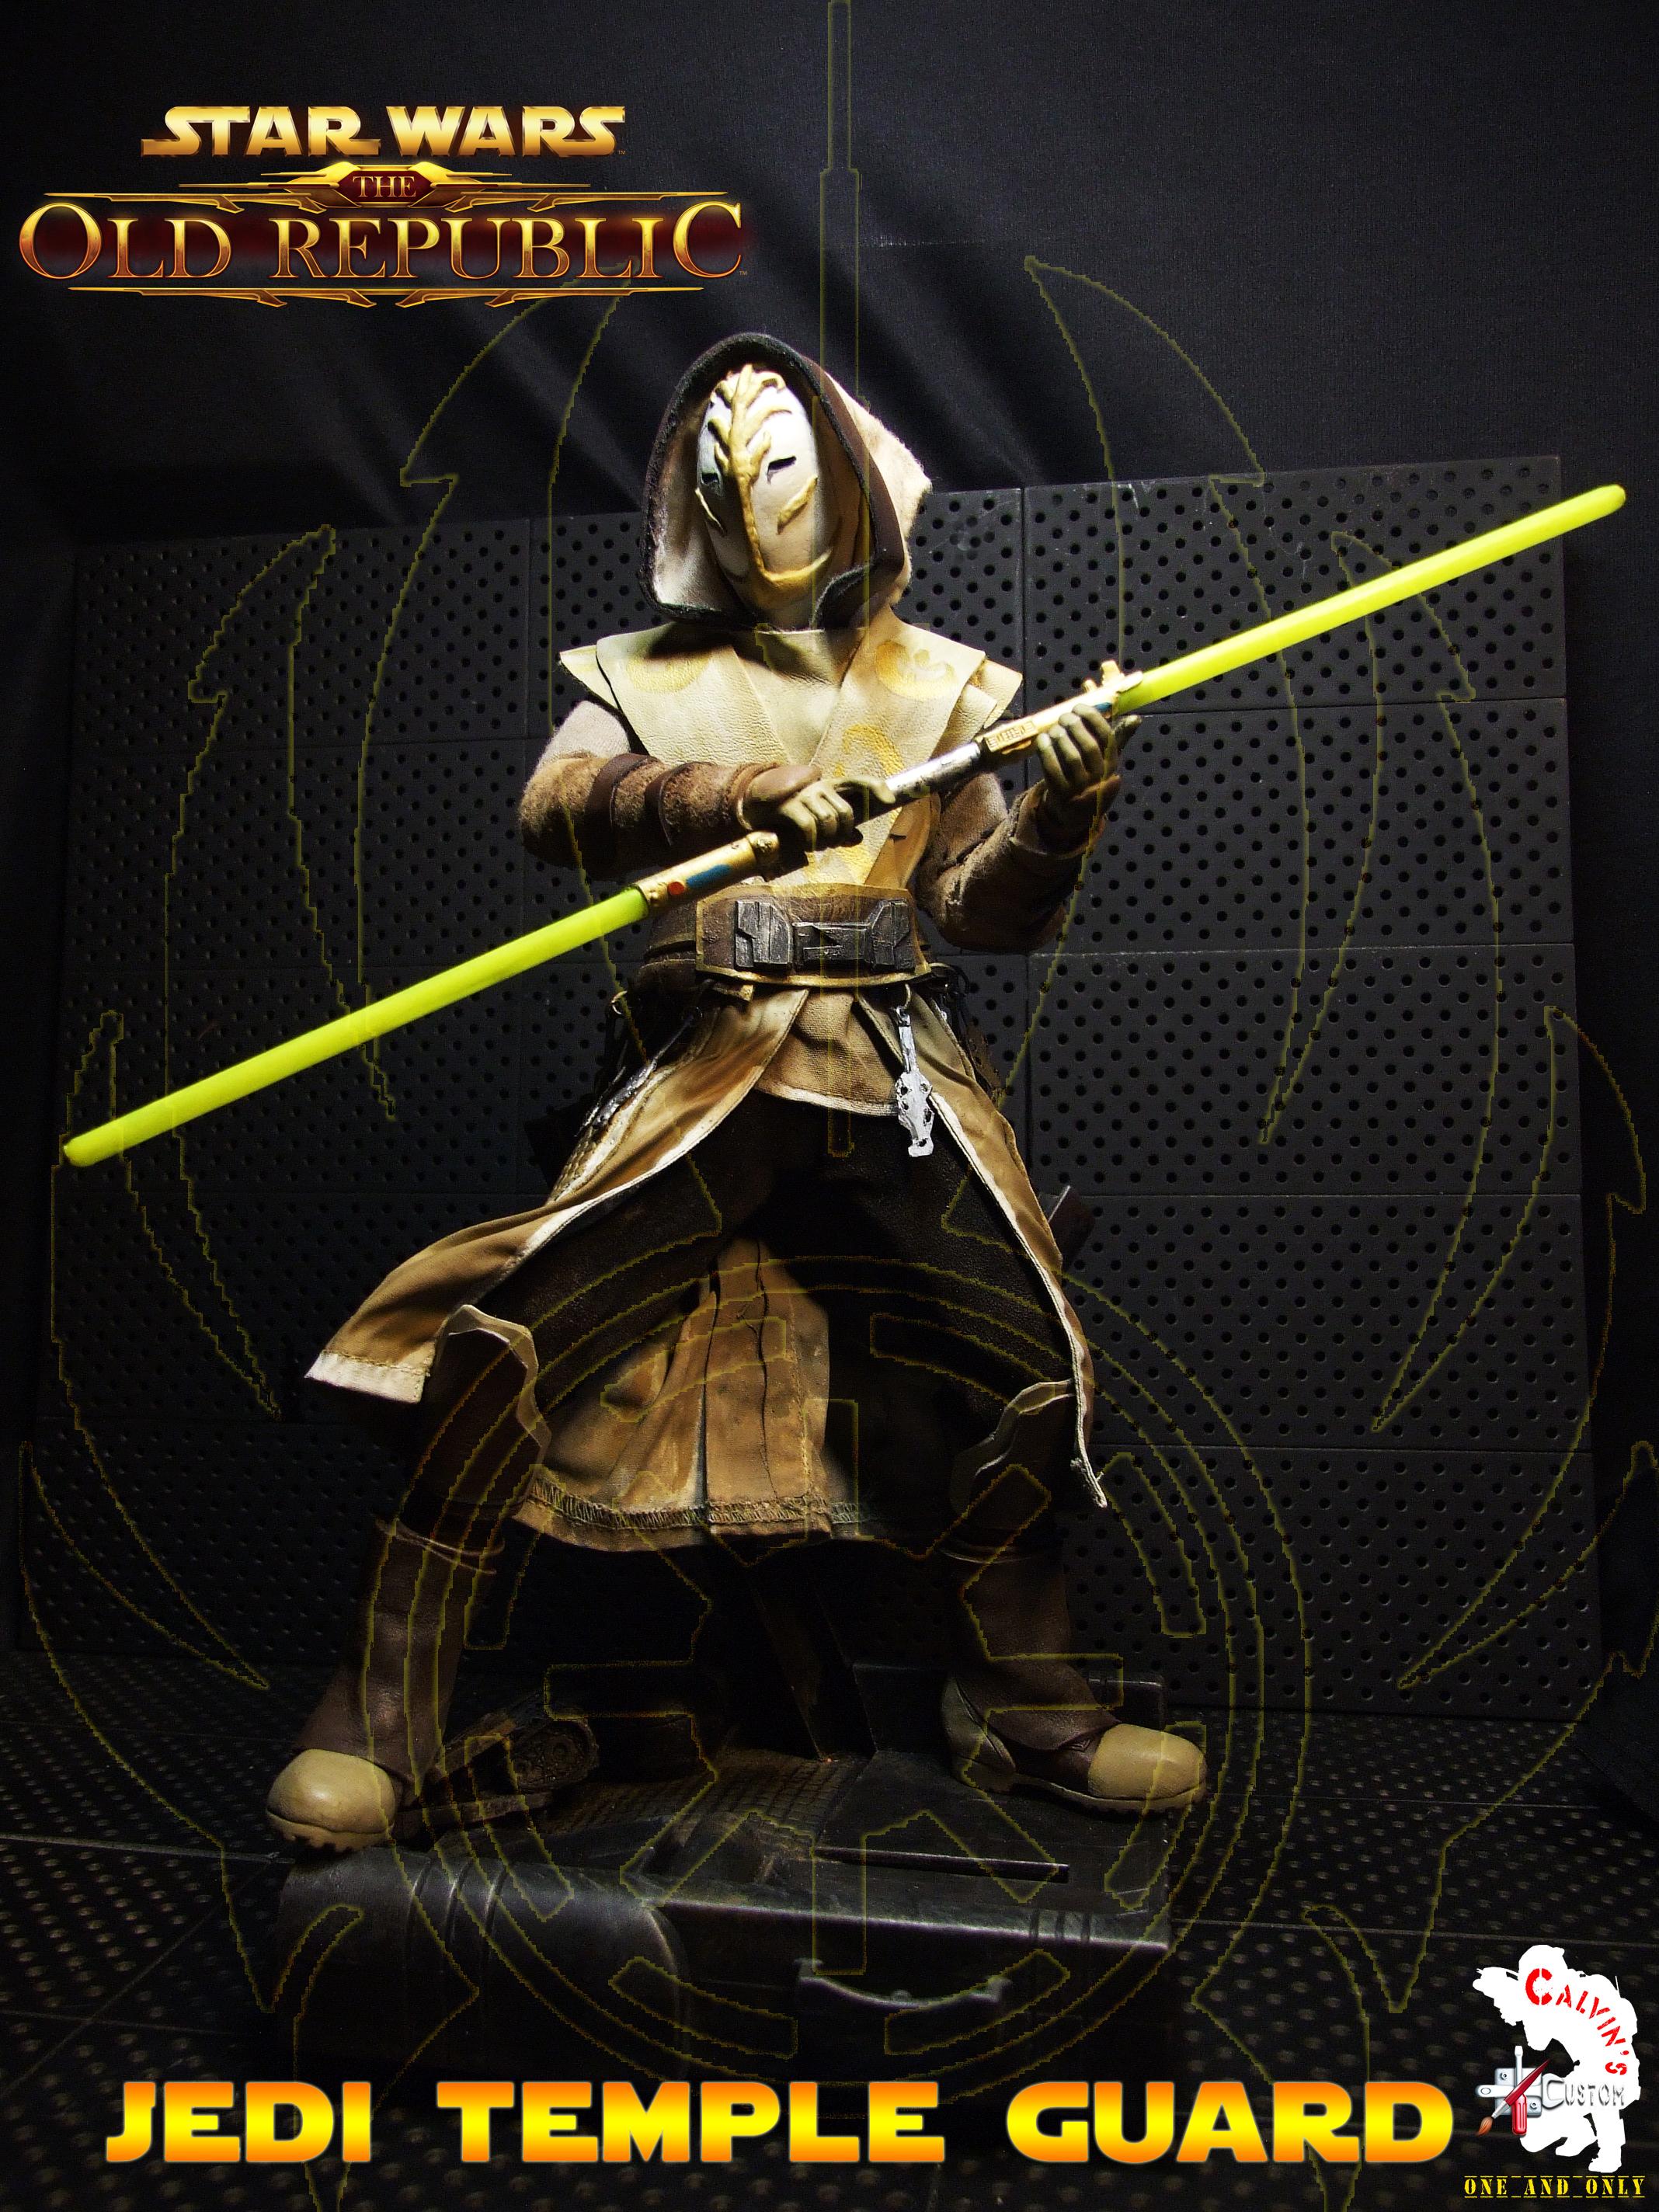 Calvin S Custom One Sixth Starwars The Old Republic Jedi Temple Guard Figure Star Wars Photo 35632921 Fanpop Page 8